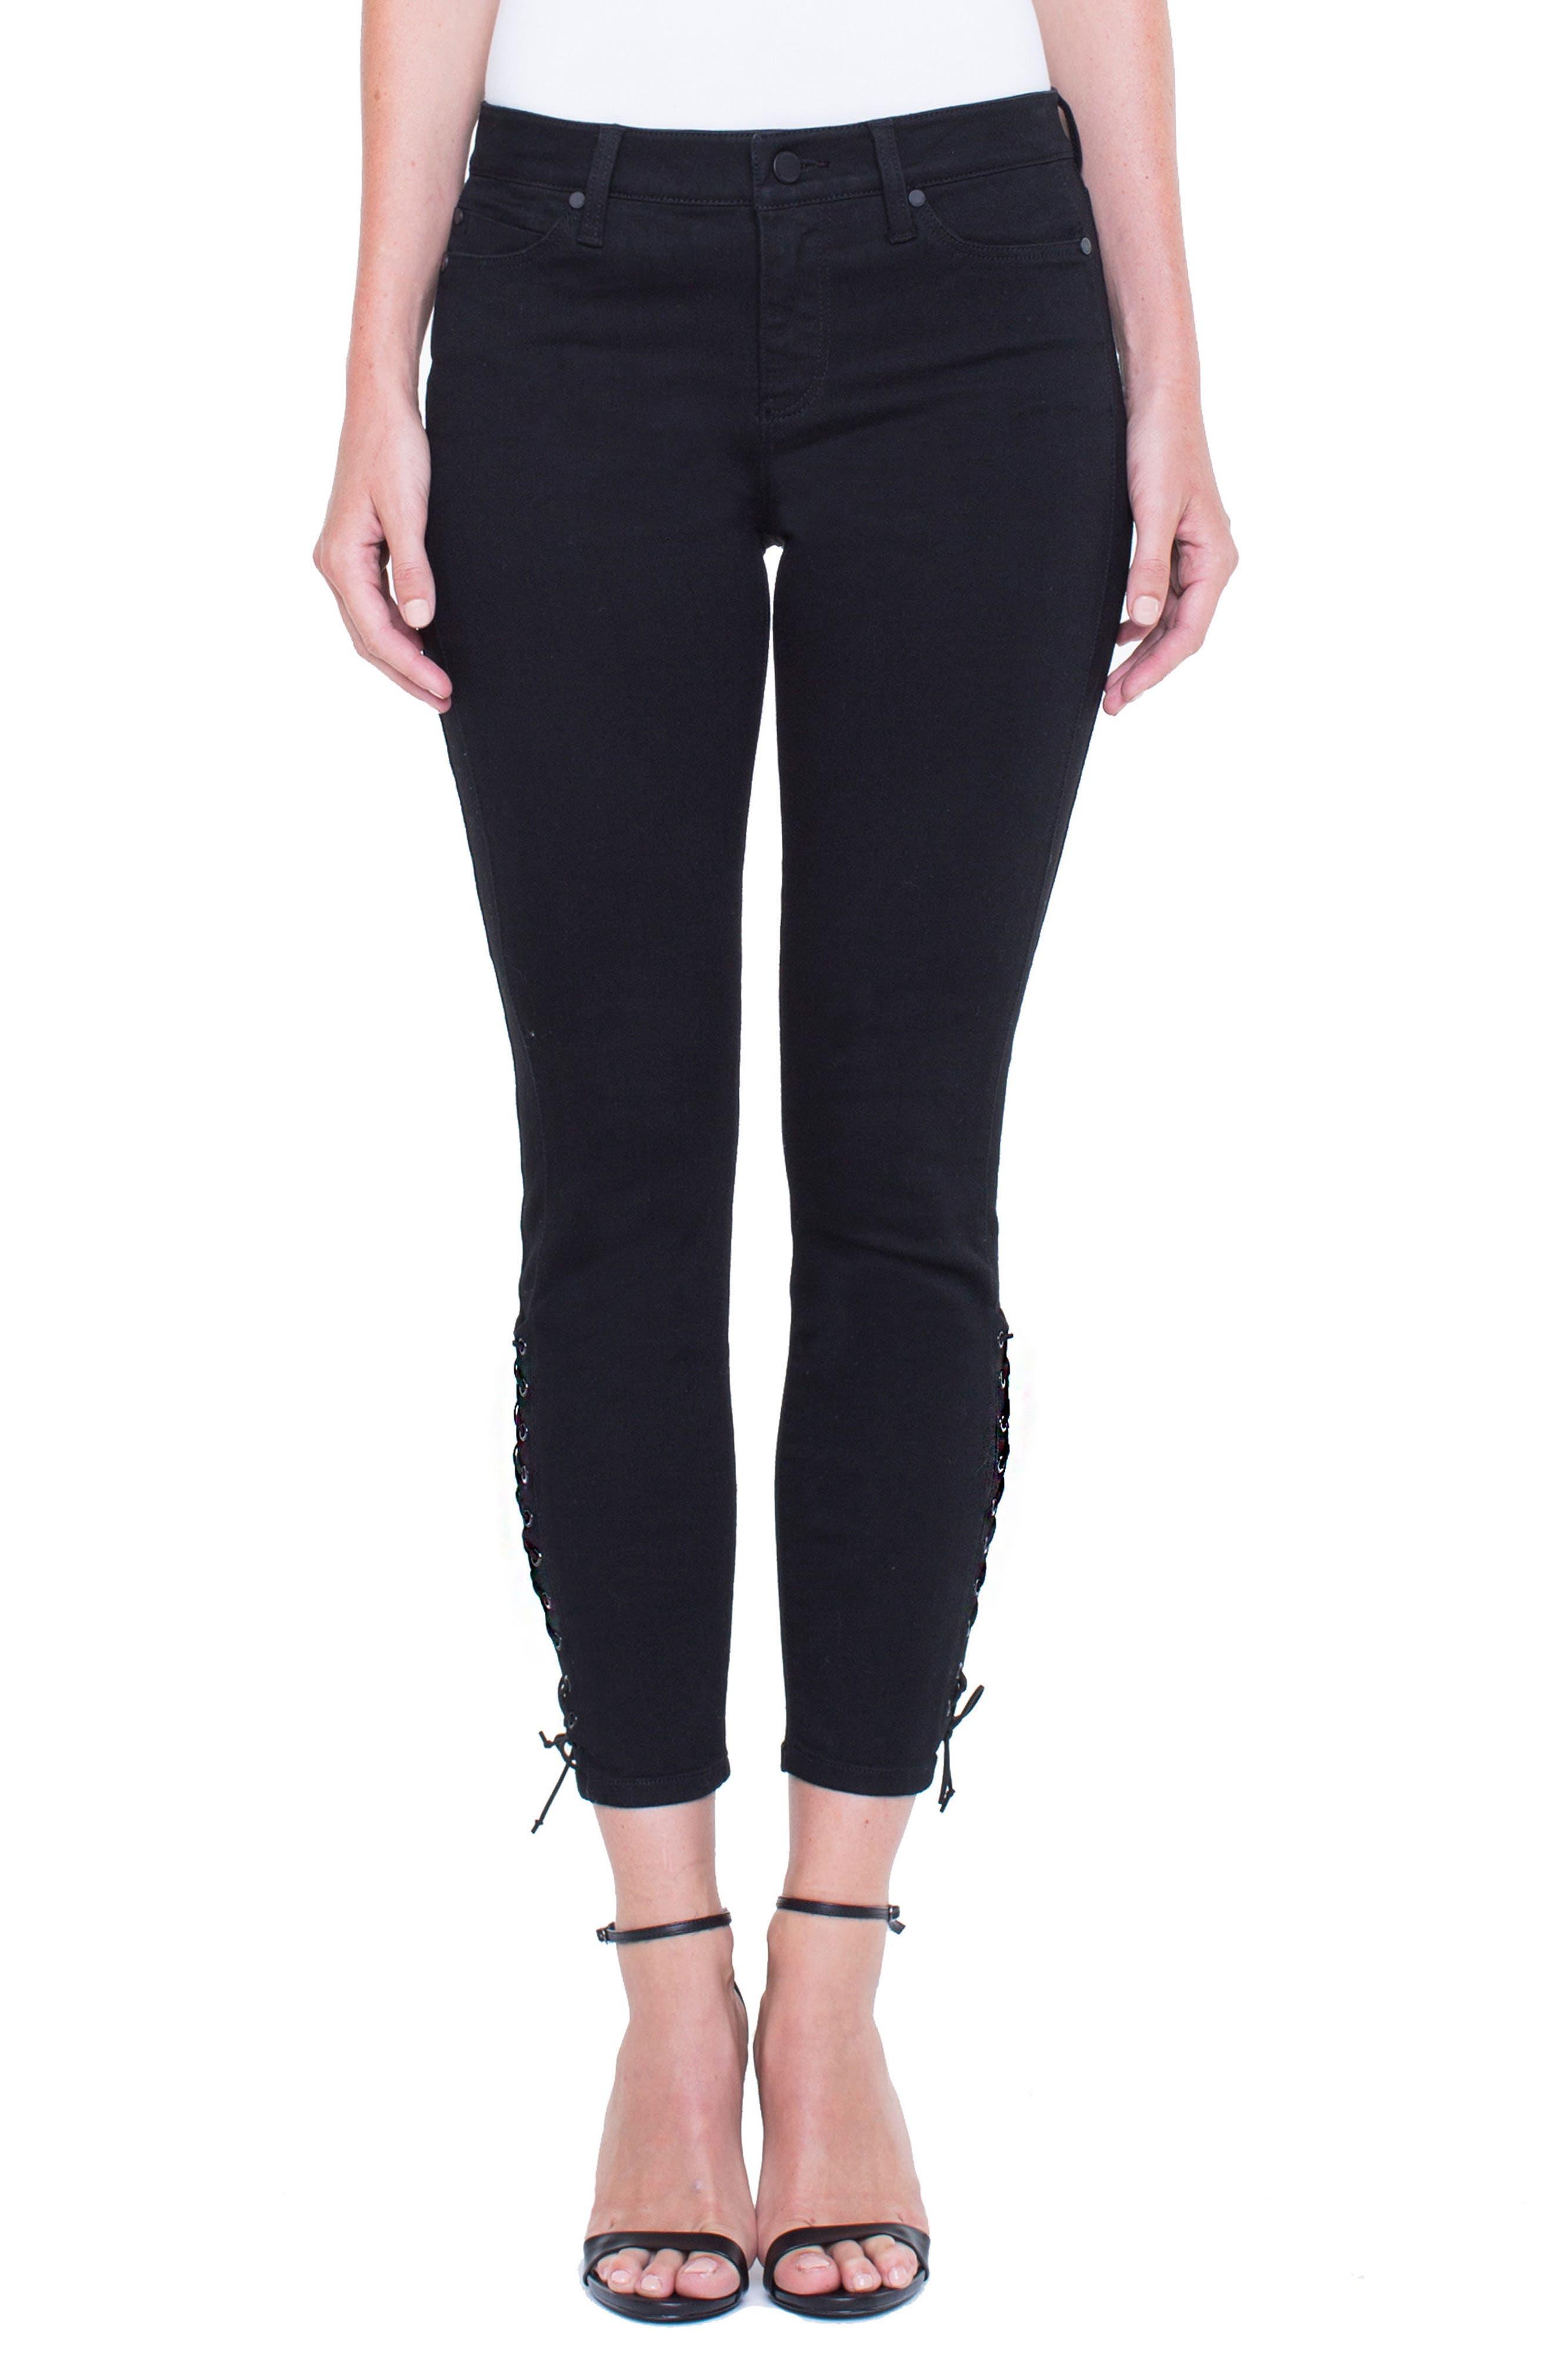 Alyssa Lace-Up Crop Skinny Jeans,                         Main,                         color, Black Rinse